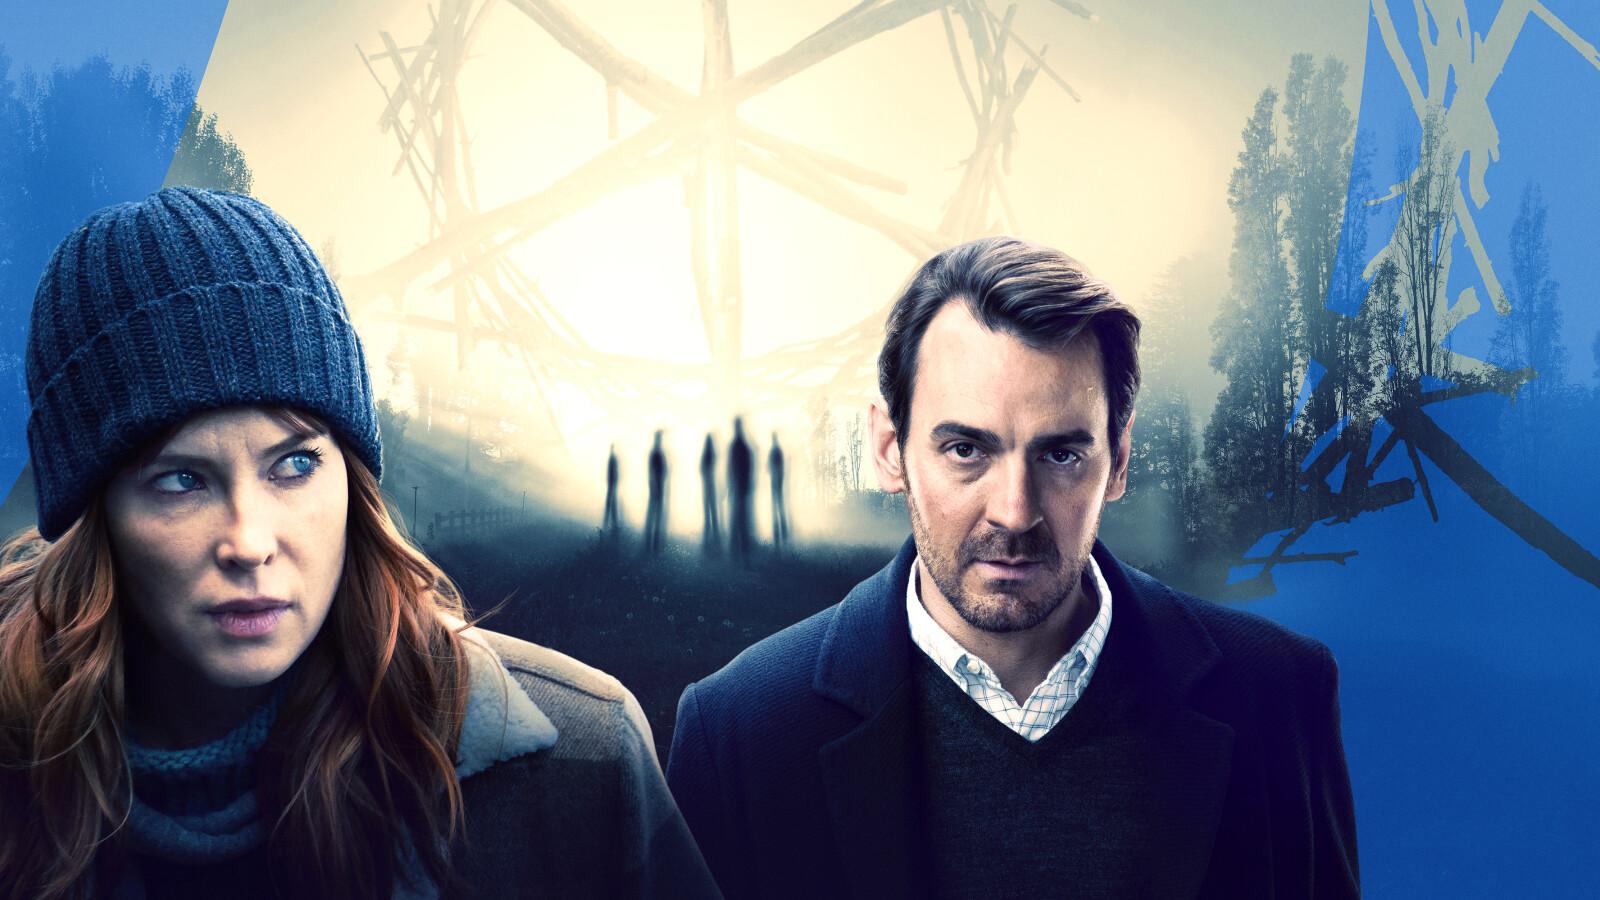 The Gloaming | Staffeln und Episodenguide | Alle Infos zur Crime-Serie